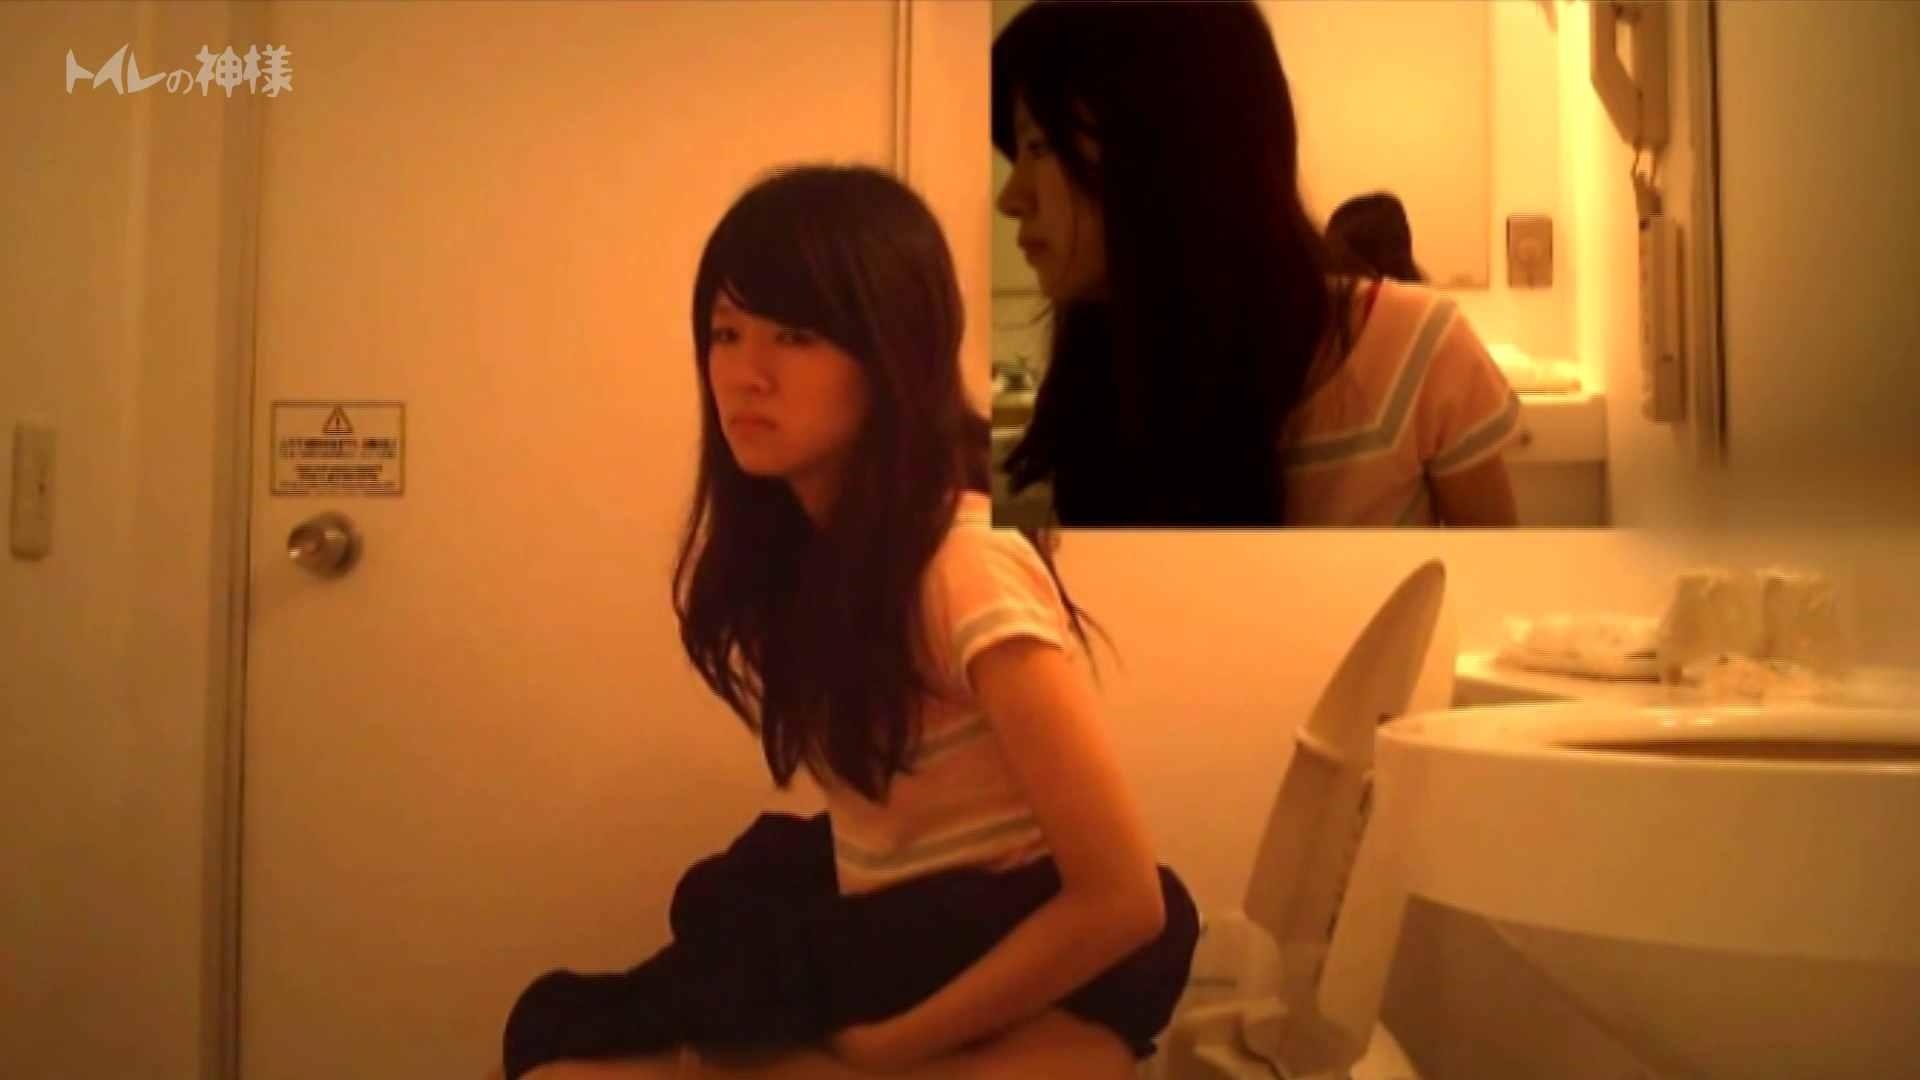 Vol.04 女子大生のトイレ恥態 トイレ盗撮  92枚 42